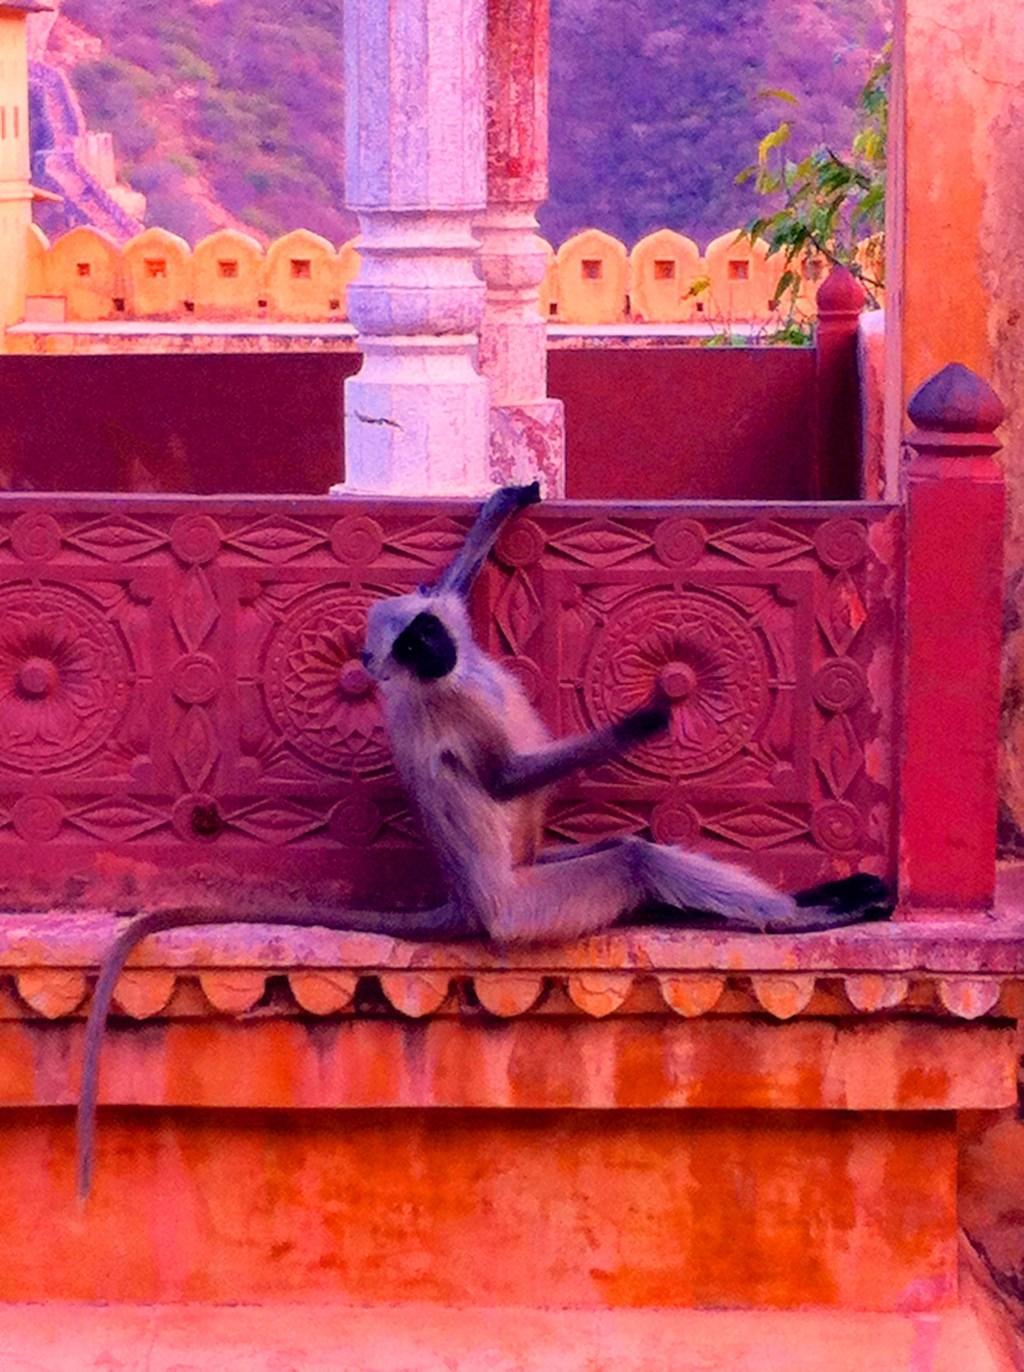 Monkeys - crazy and often vicious